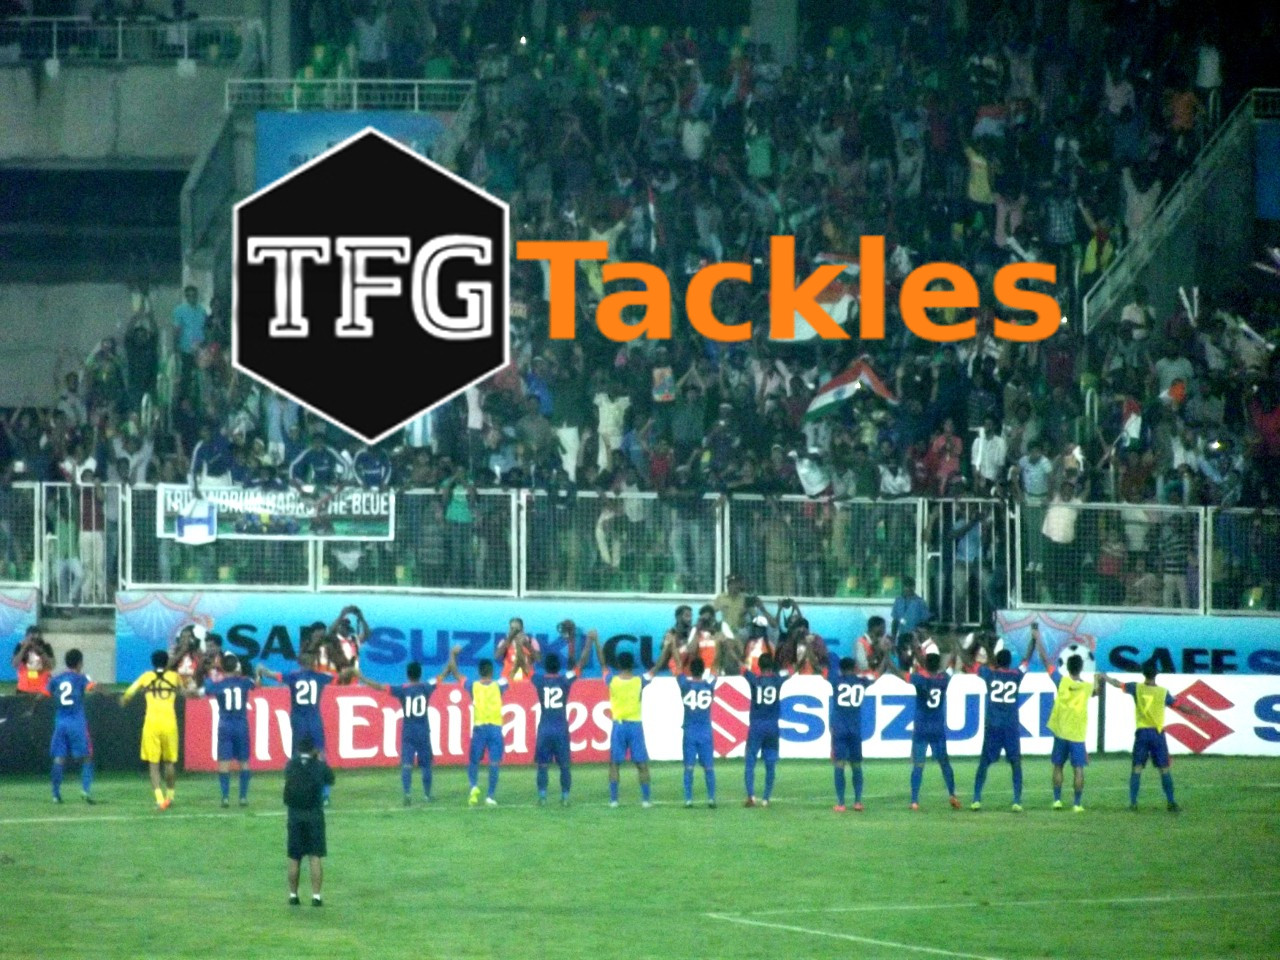 tfg tackles episode 1 super cup i league title race